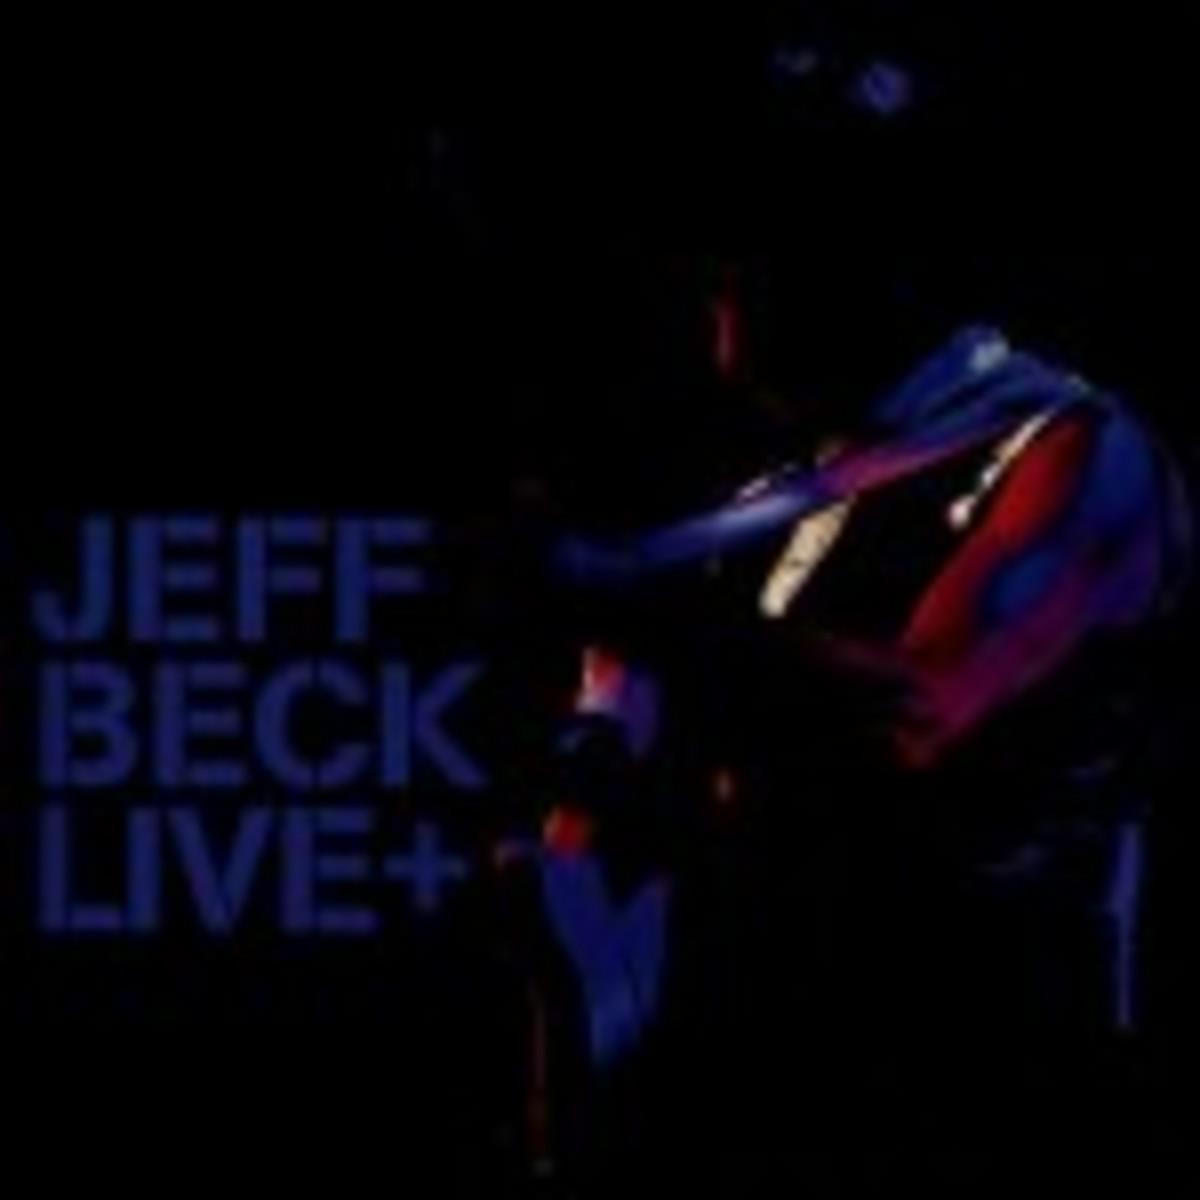 jeff-beck-live+